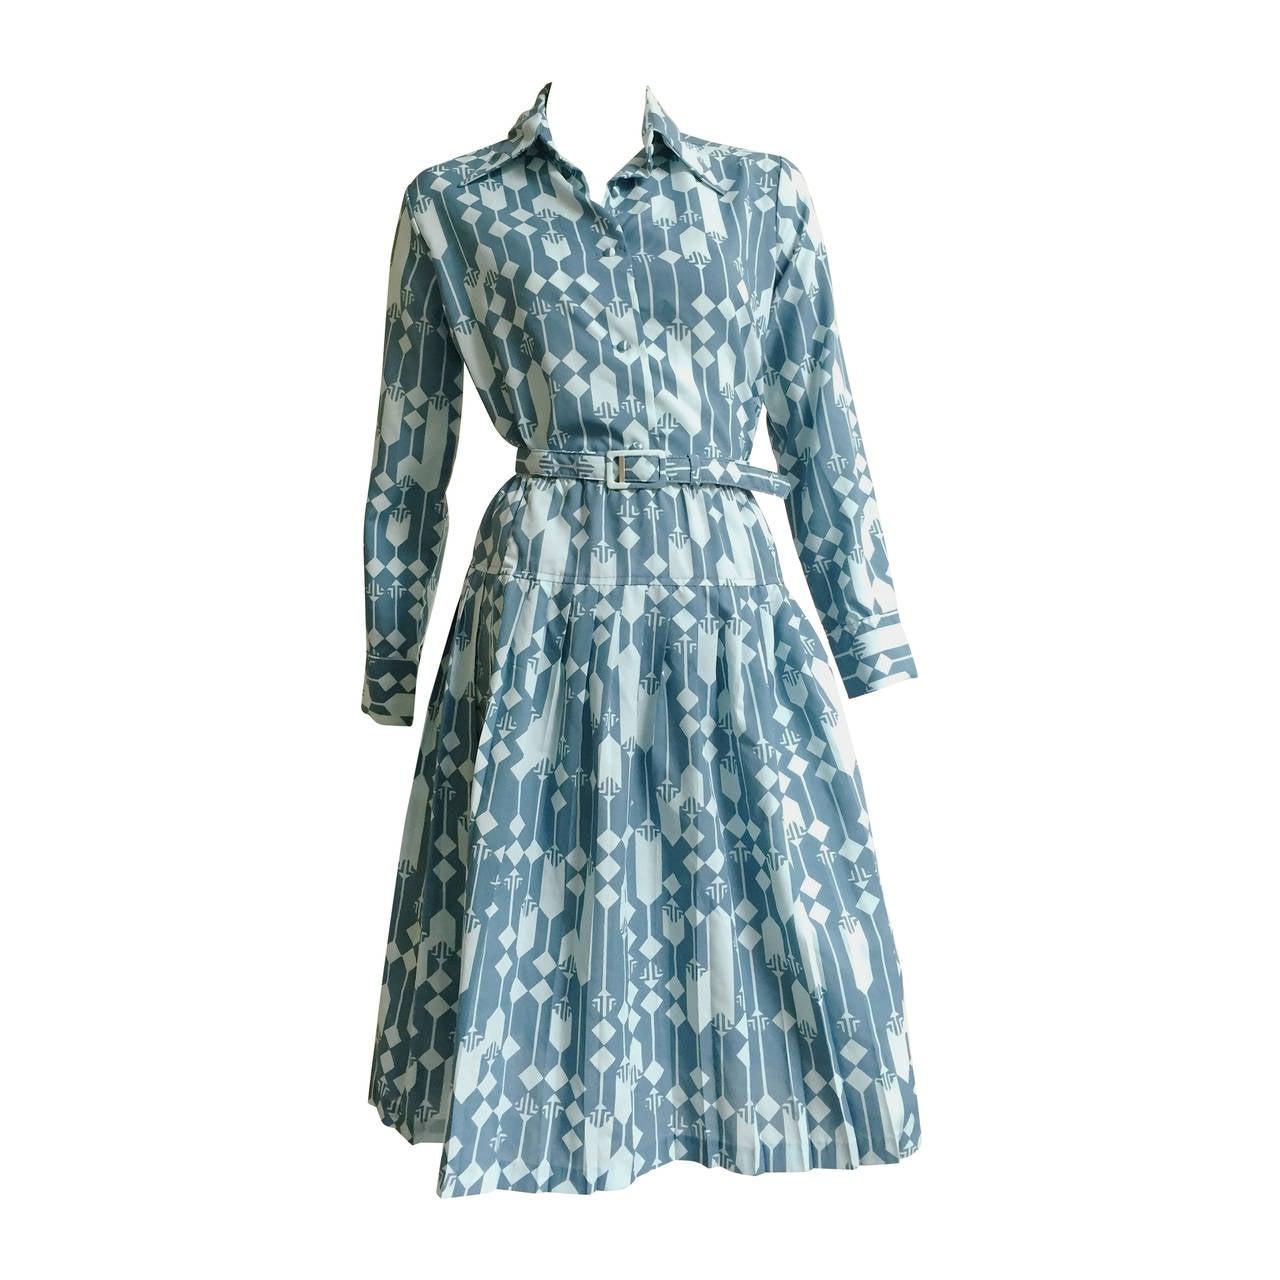 Lanvin 70s Dress Size 8. 1